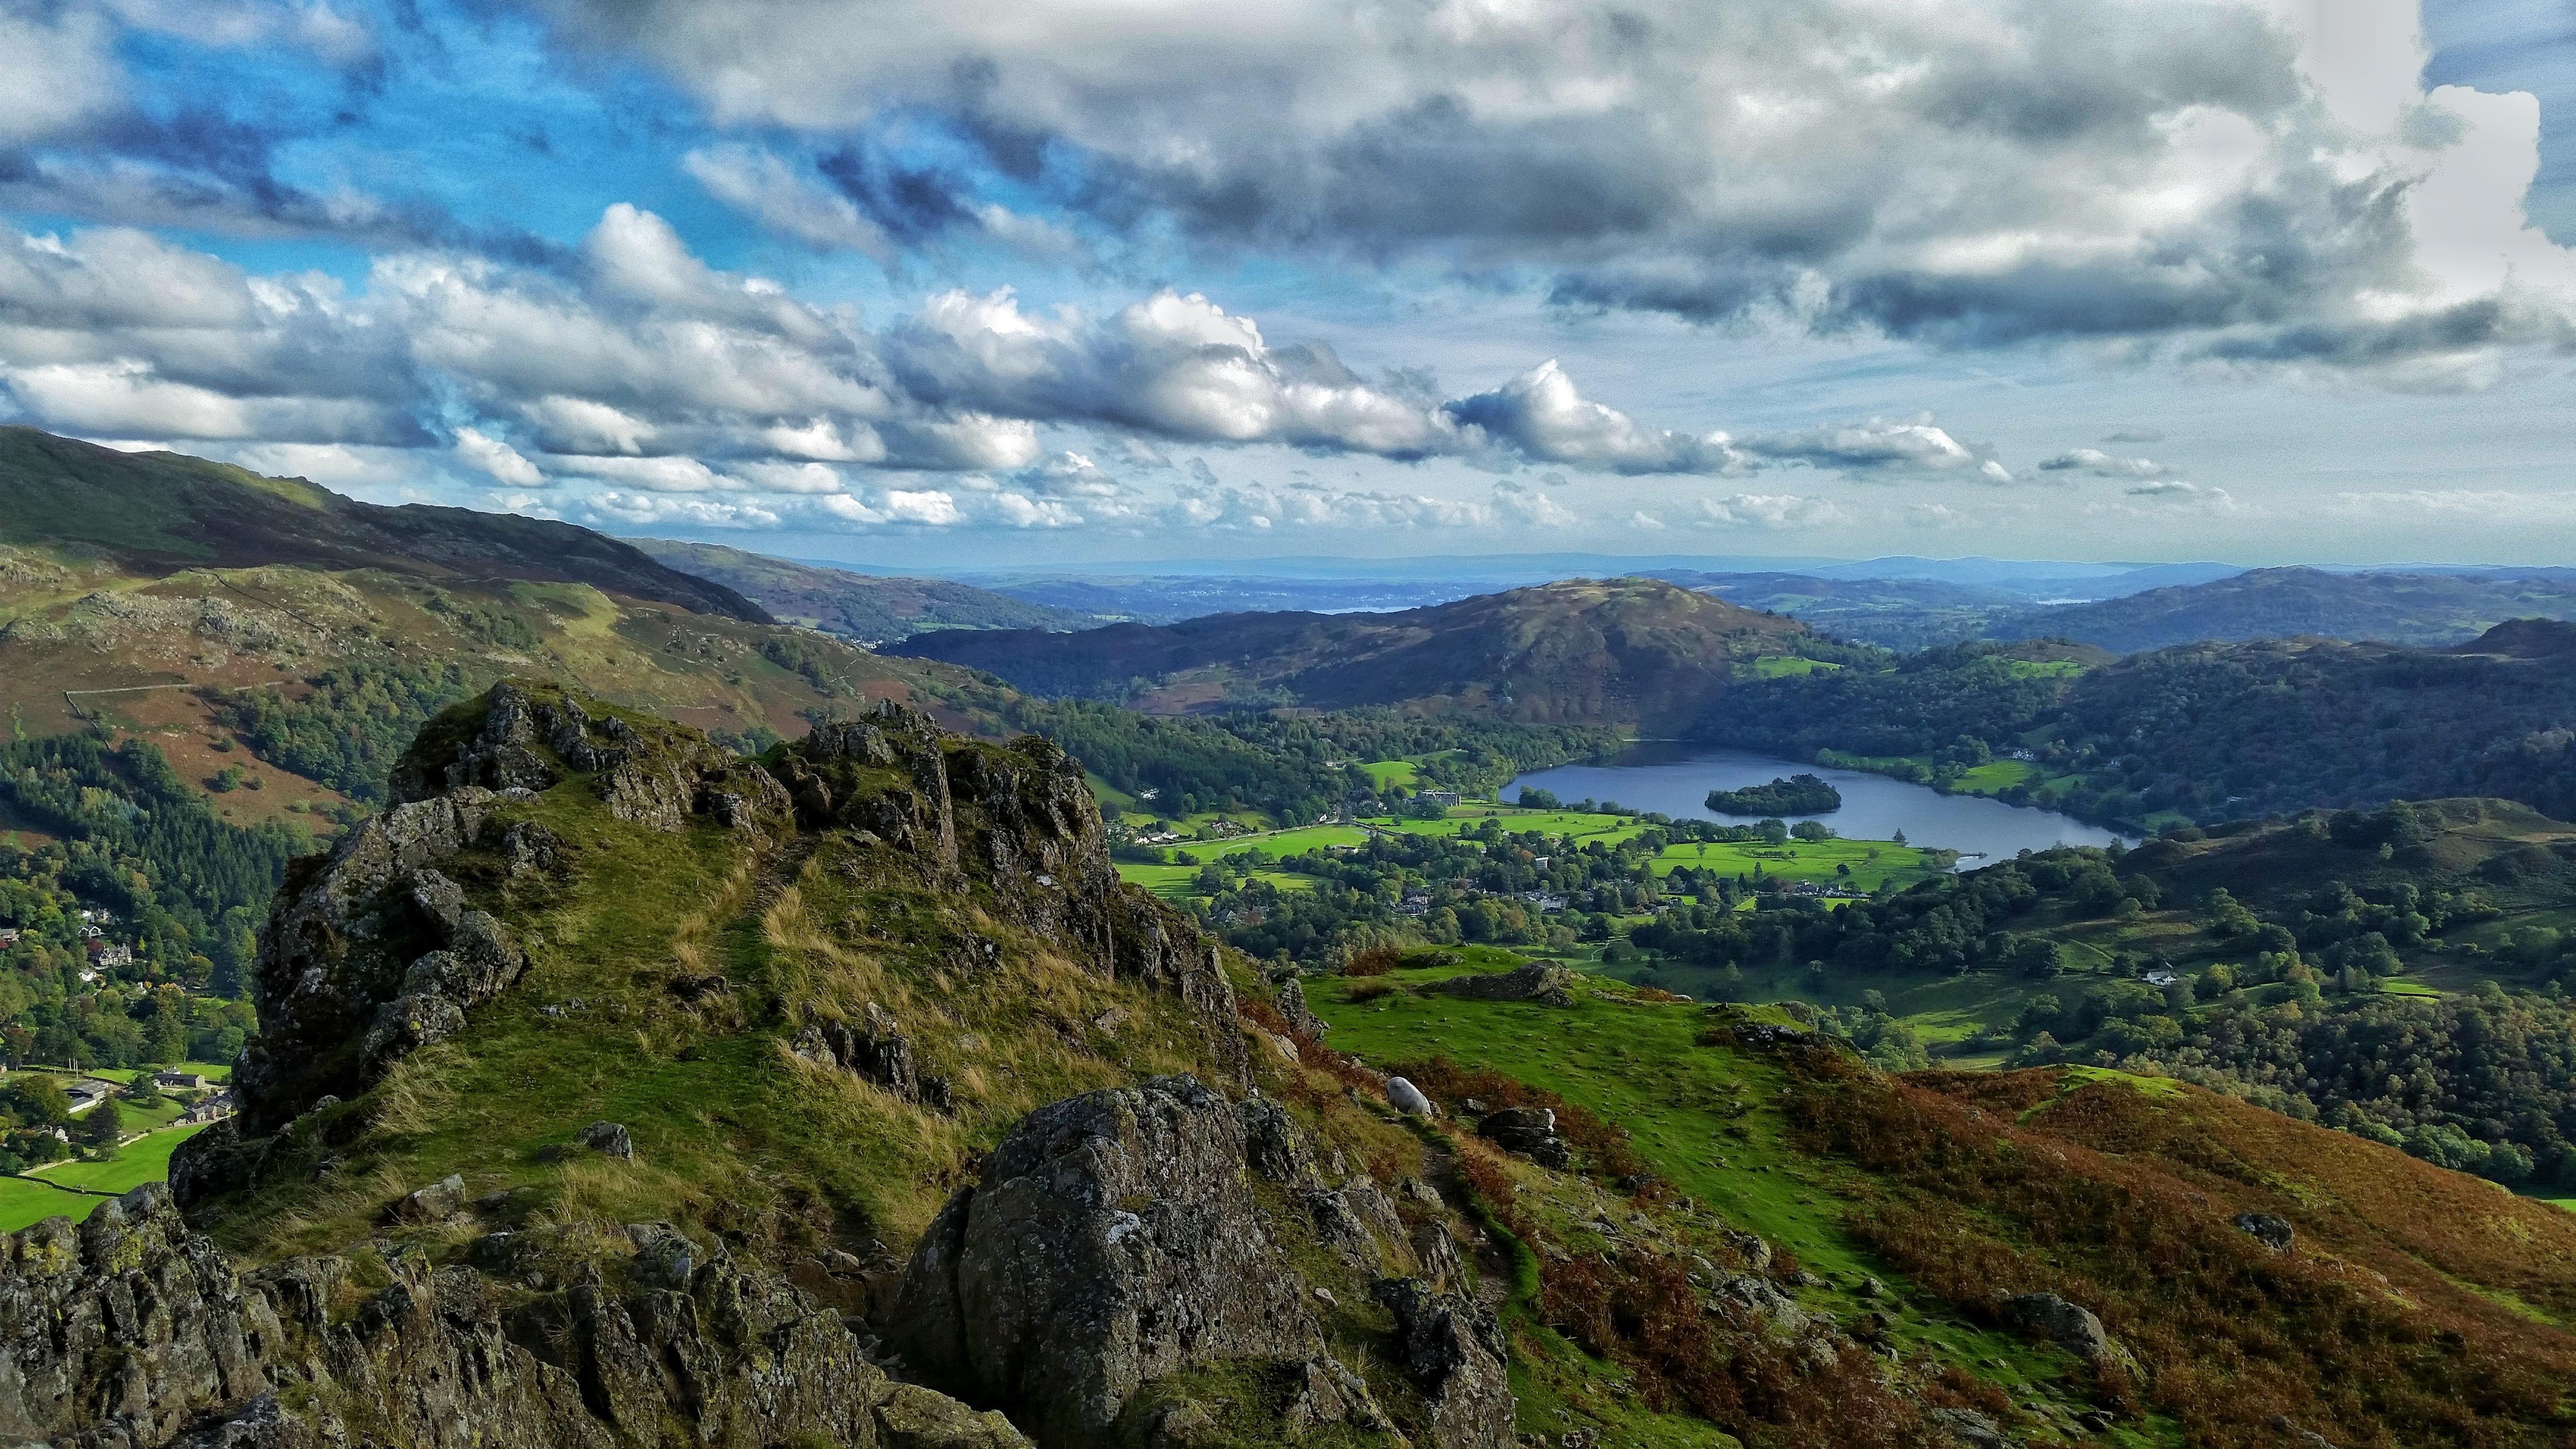 Lake District National Park Cumbria England Oc 5312x2988 Http Ift Tt 2yz4kvj Lake District National Park Lake District Landscape Pictures